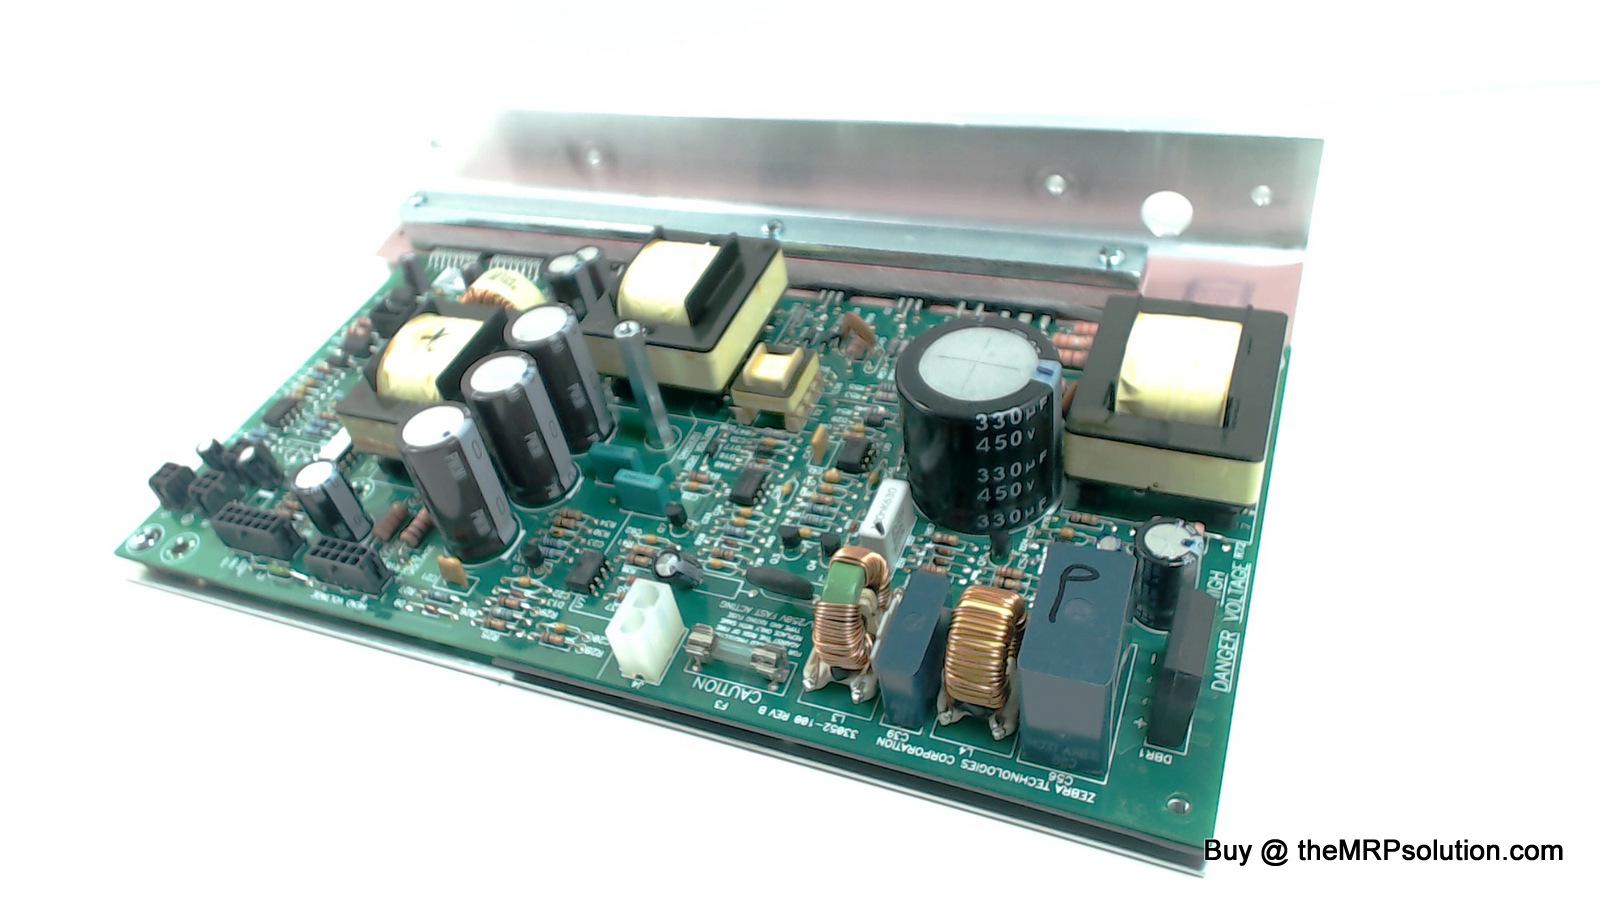 ZEBRA 33050M KIT, MAINT., AC/DC POWER SUPPLY New